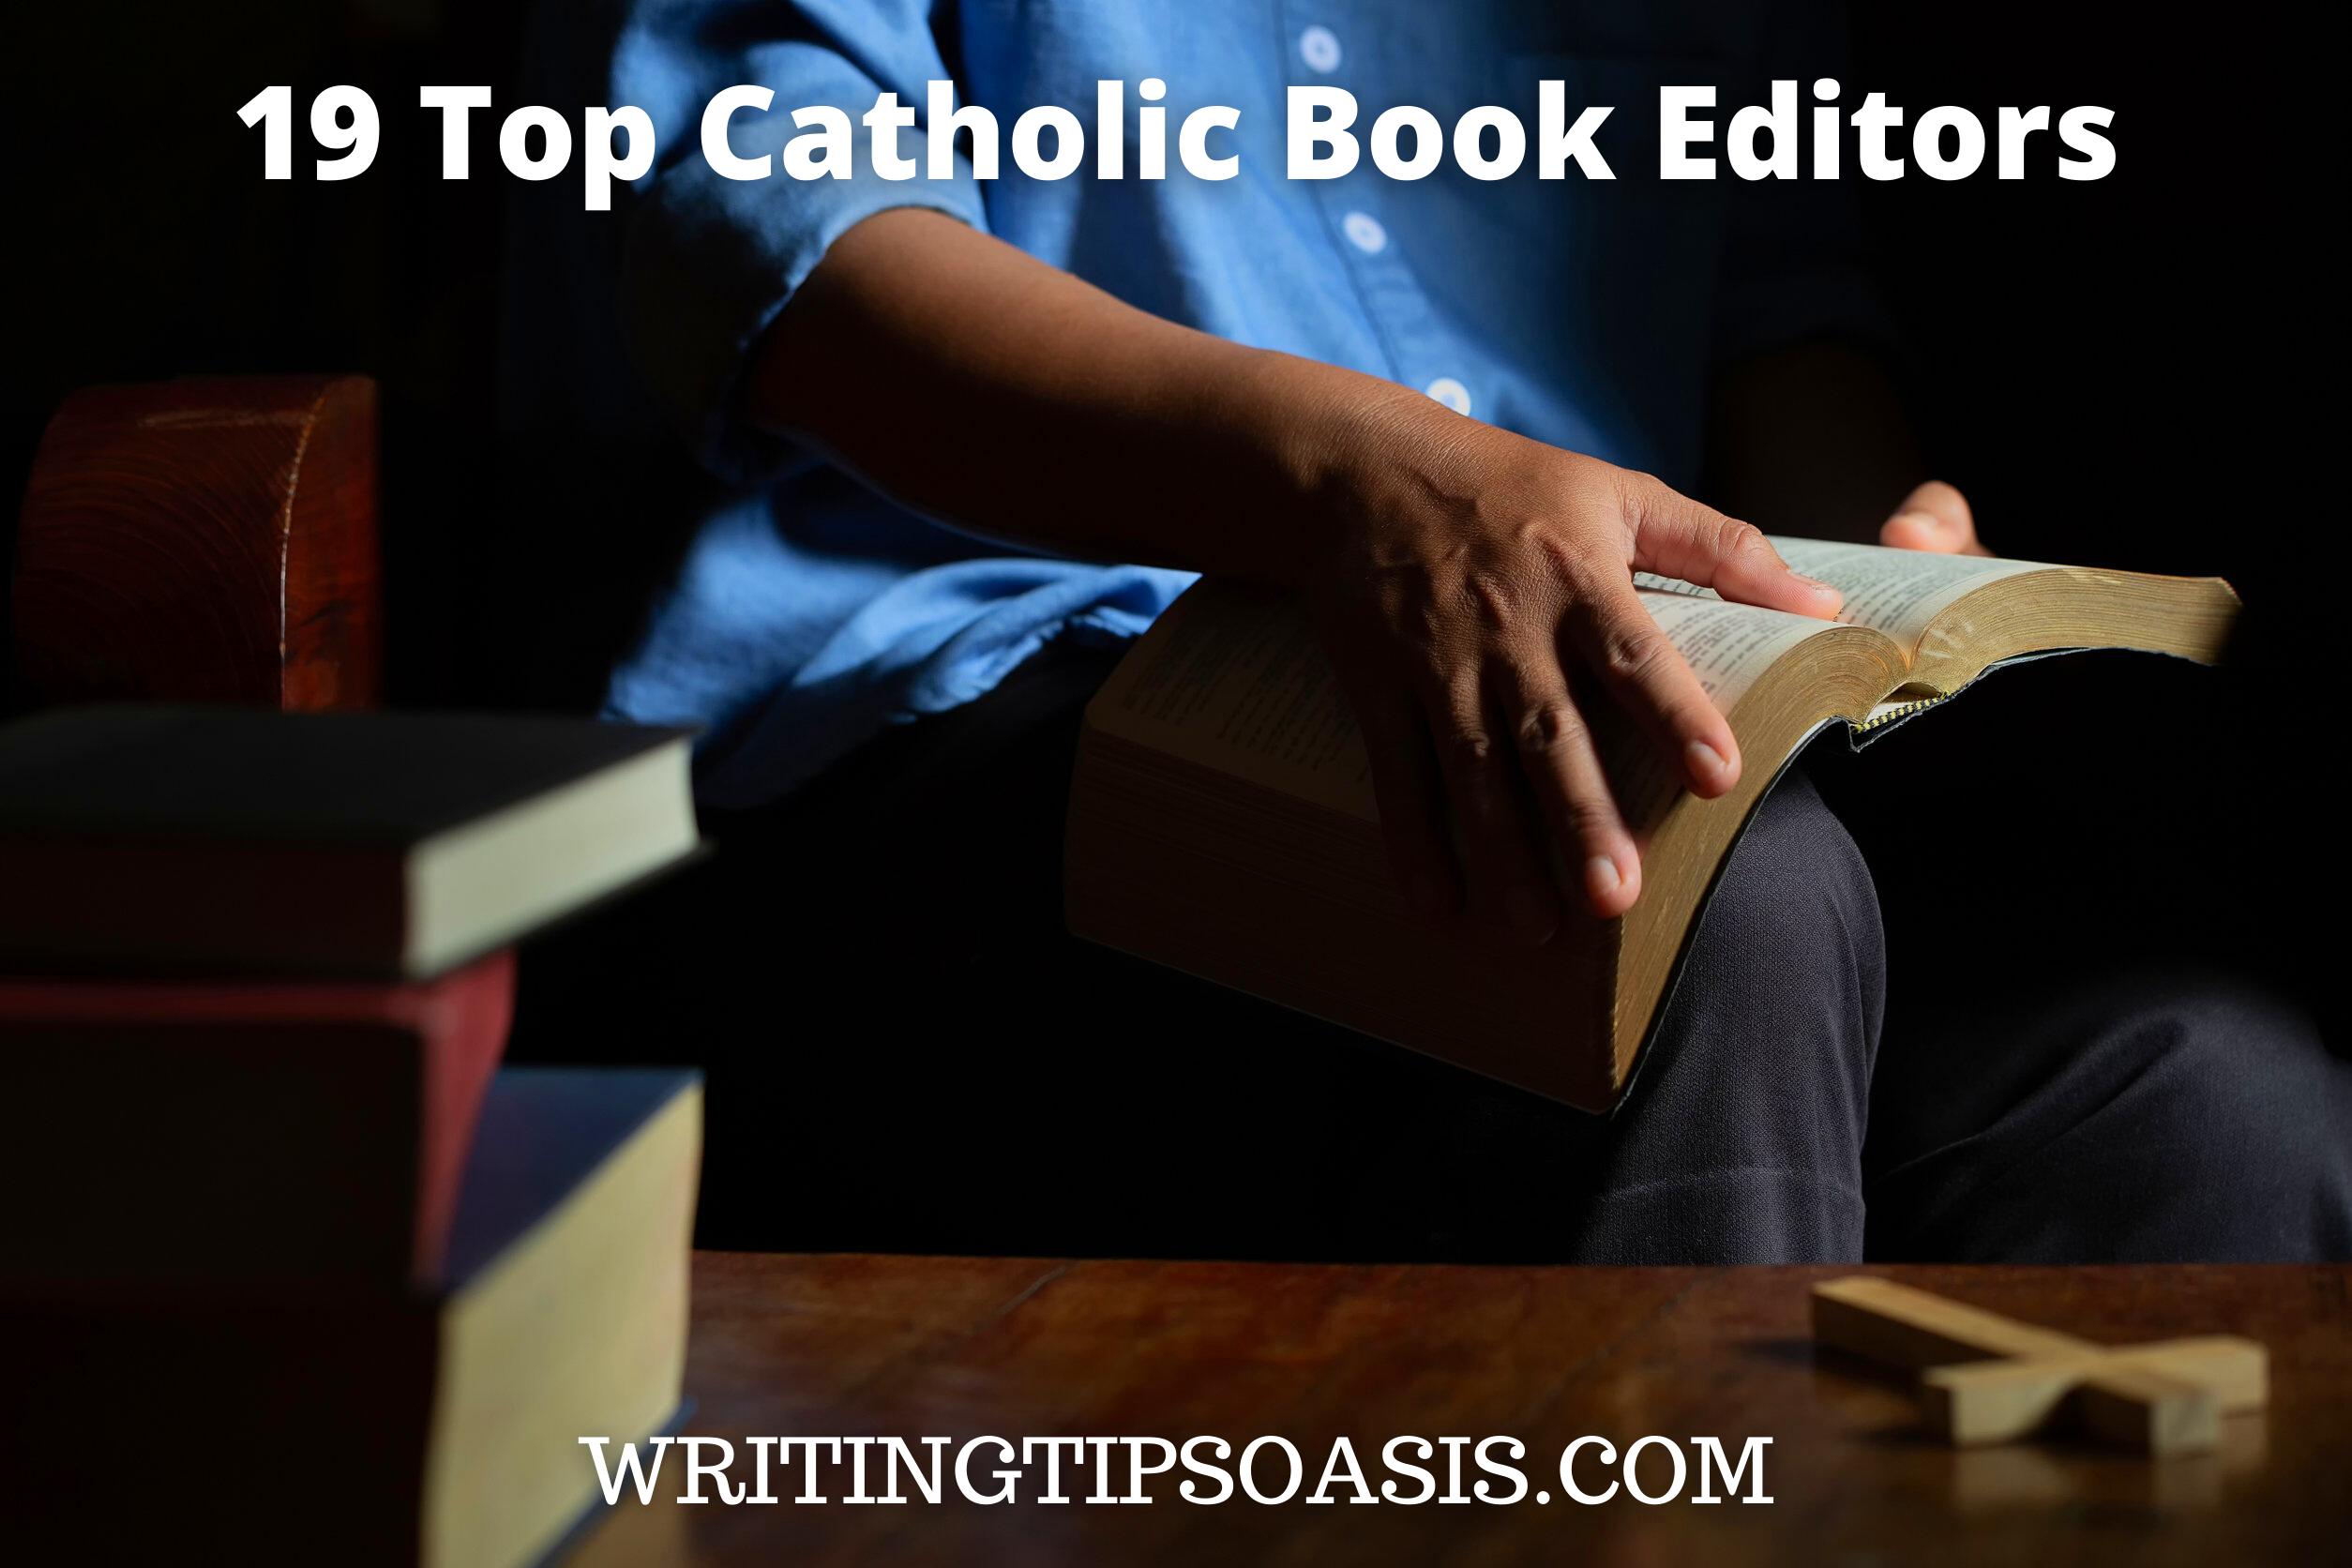 Catholic book editors